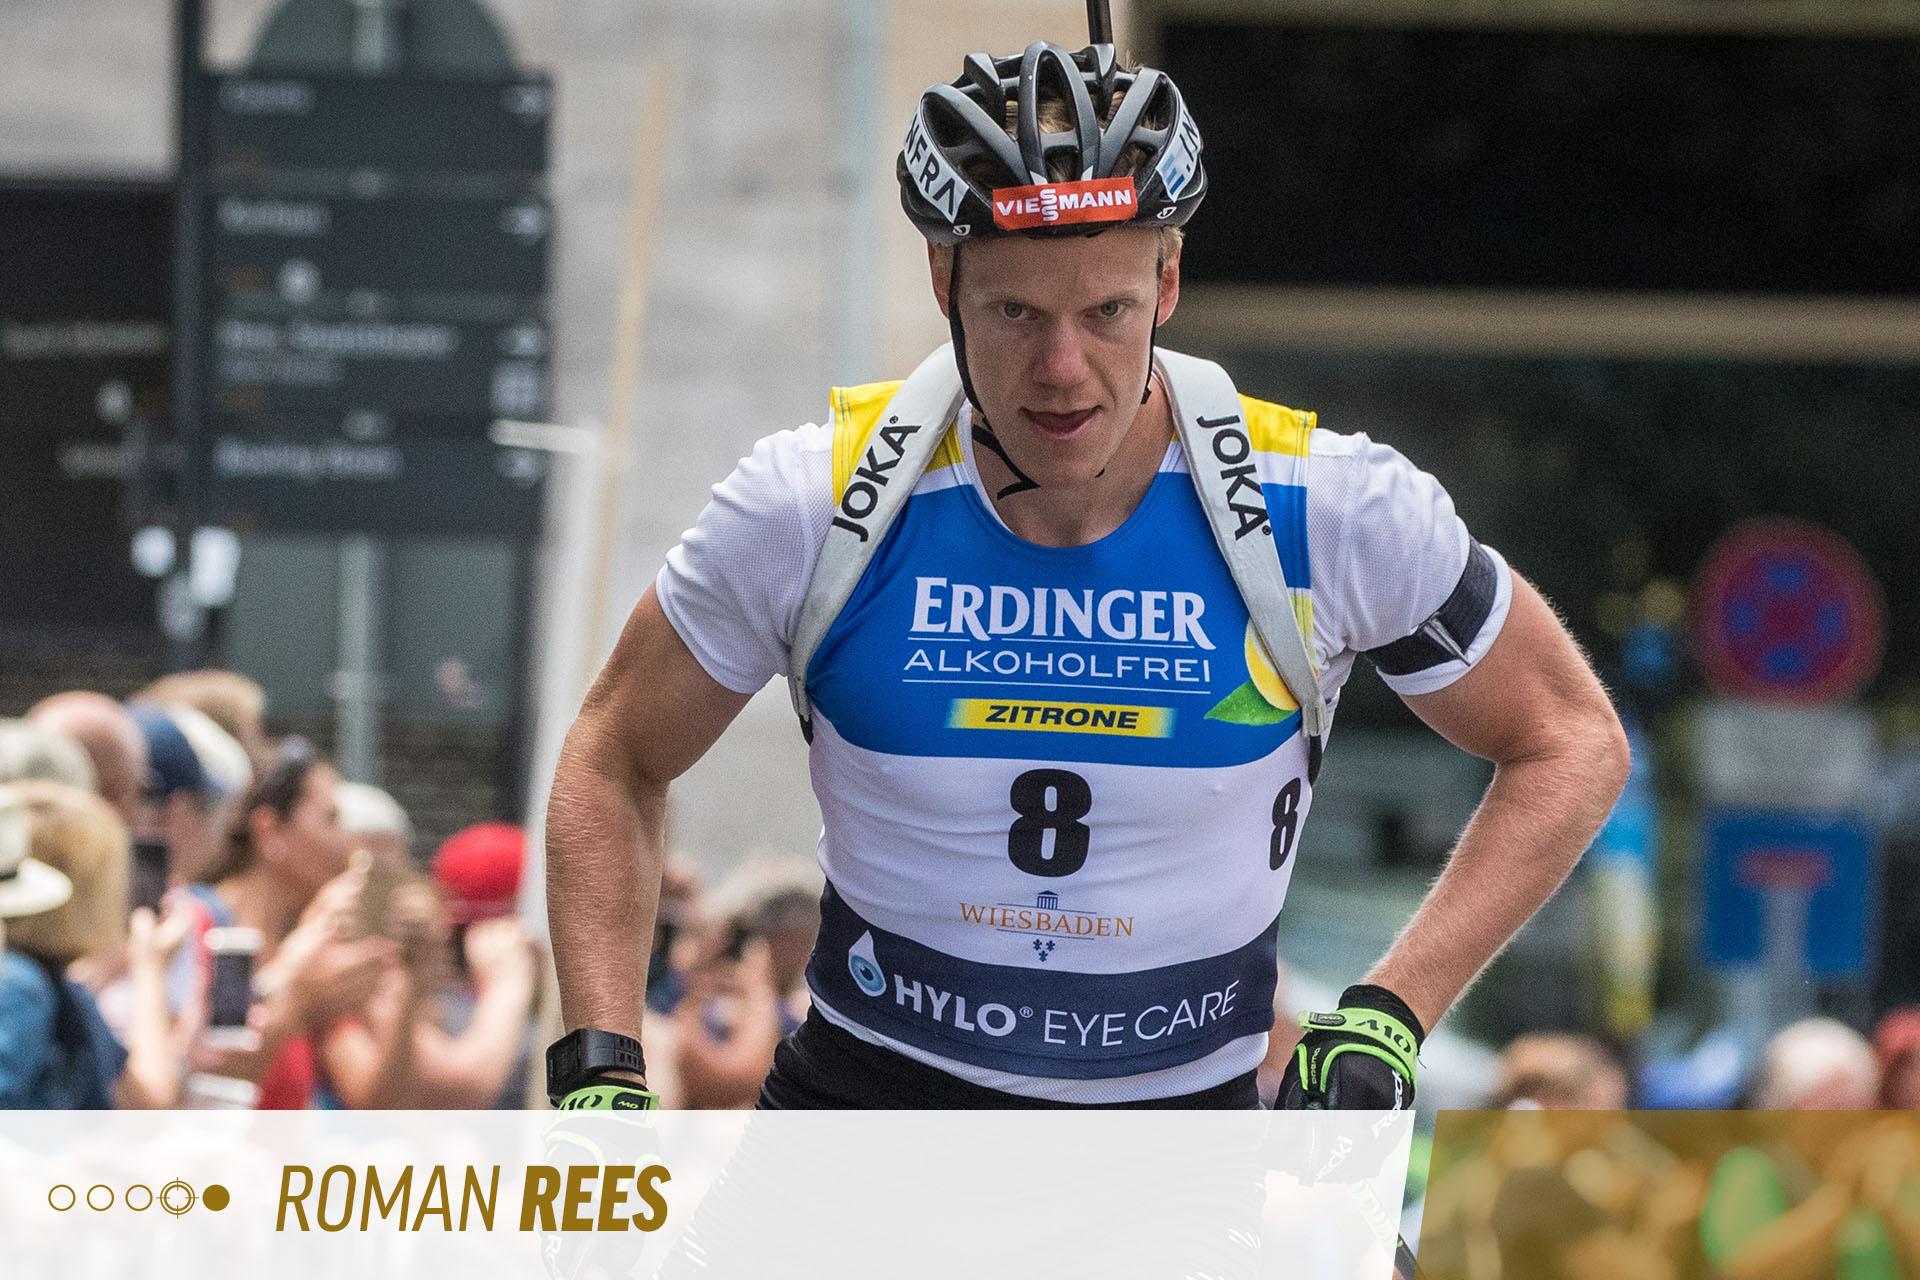 Athleten_RomanRees